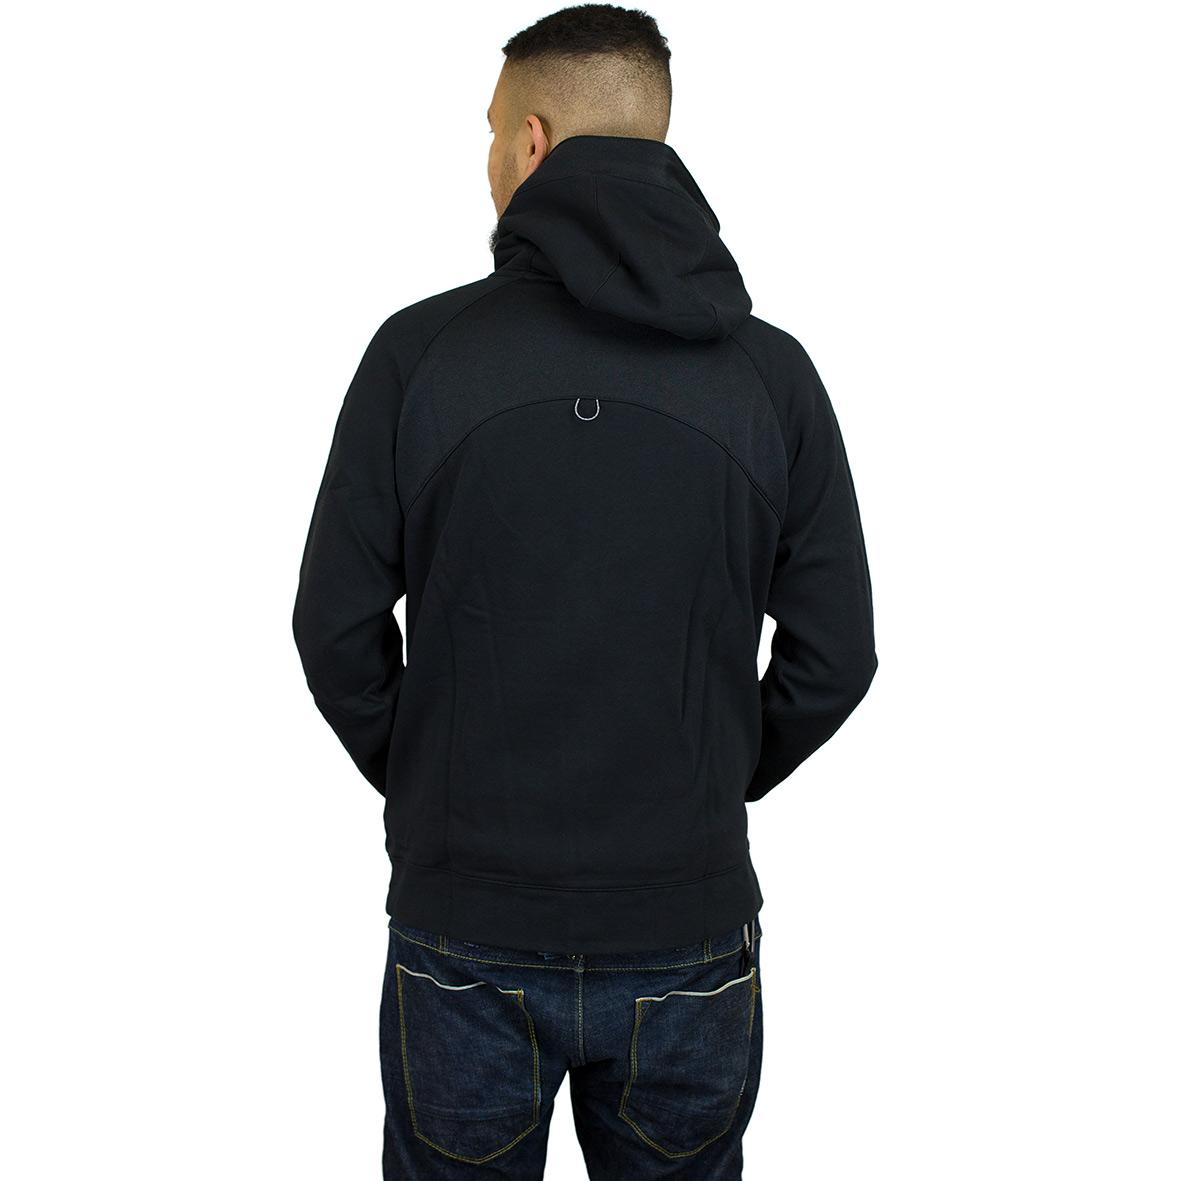 nike hoodie fullzip schwarz wei hier bestellen. Black Bedroom Furniture Sets. Home Design Ideas